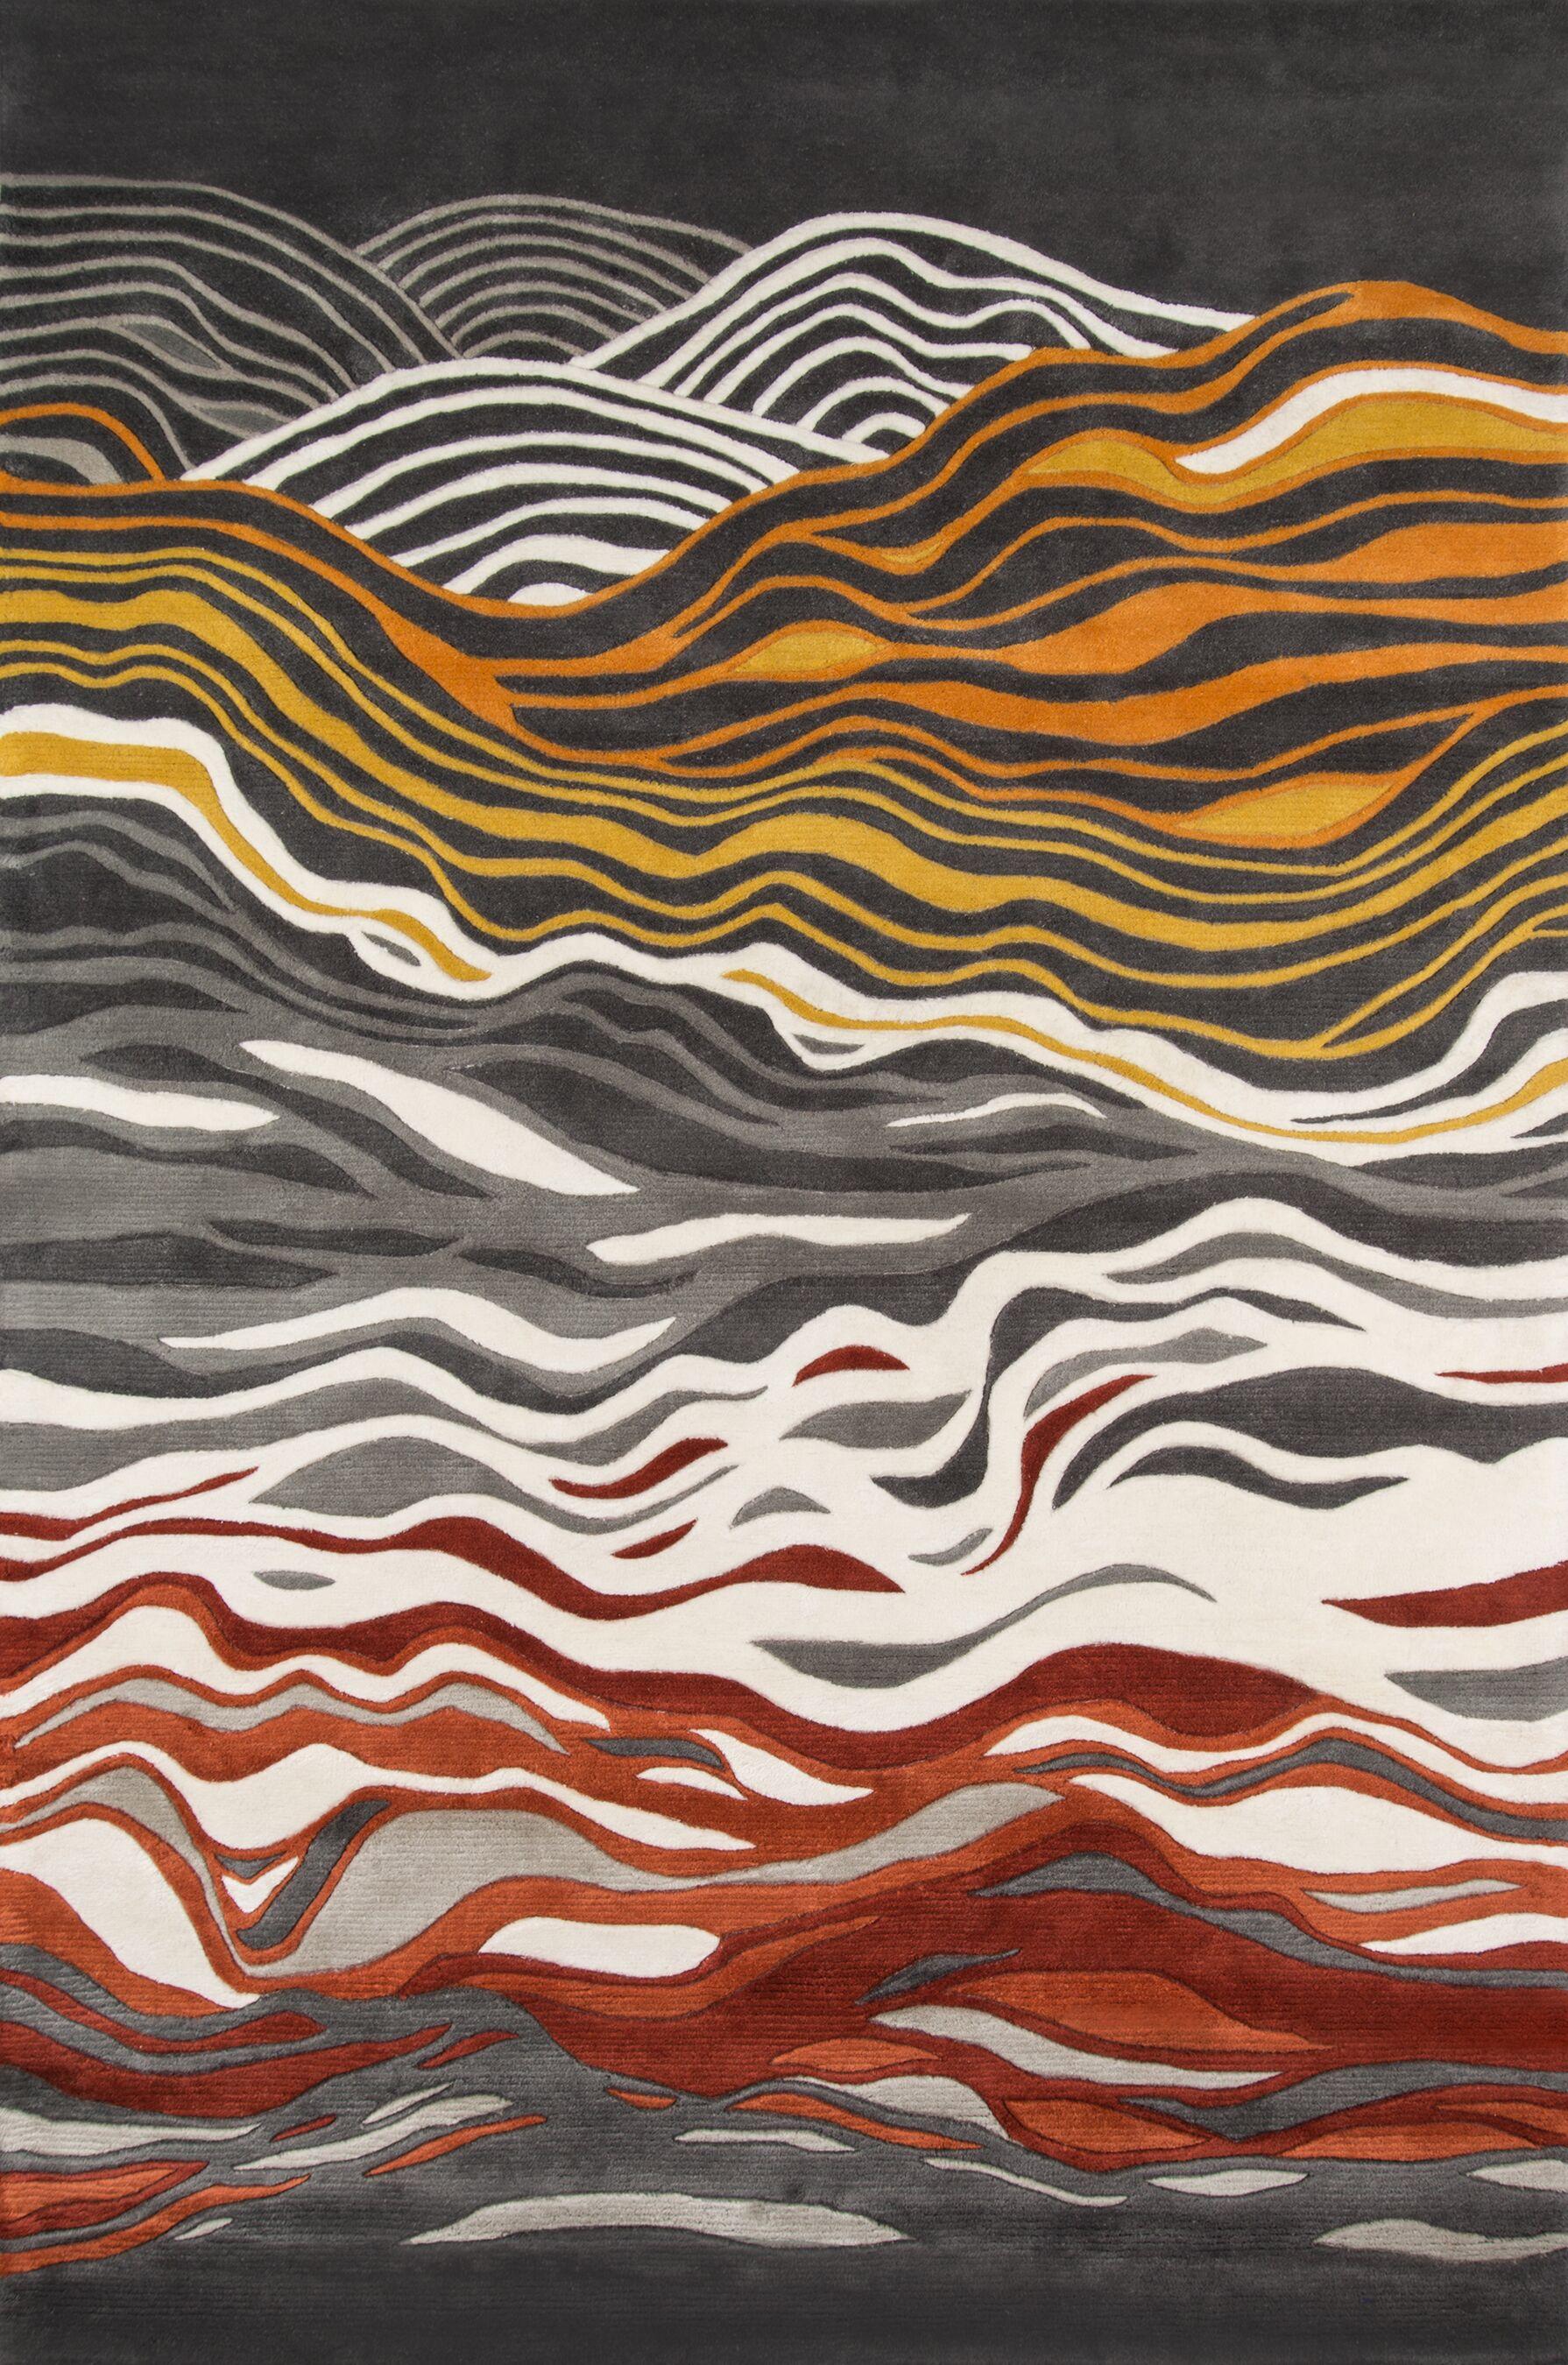 Tyrone Hand-Tufted Gray Area Rug Rug Size: Rectangle 8' x 11'